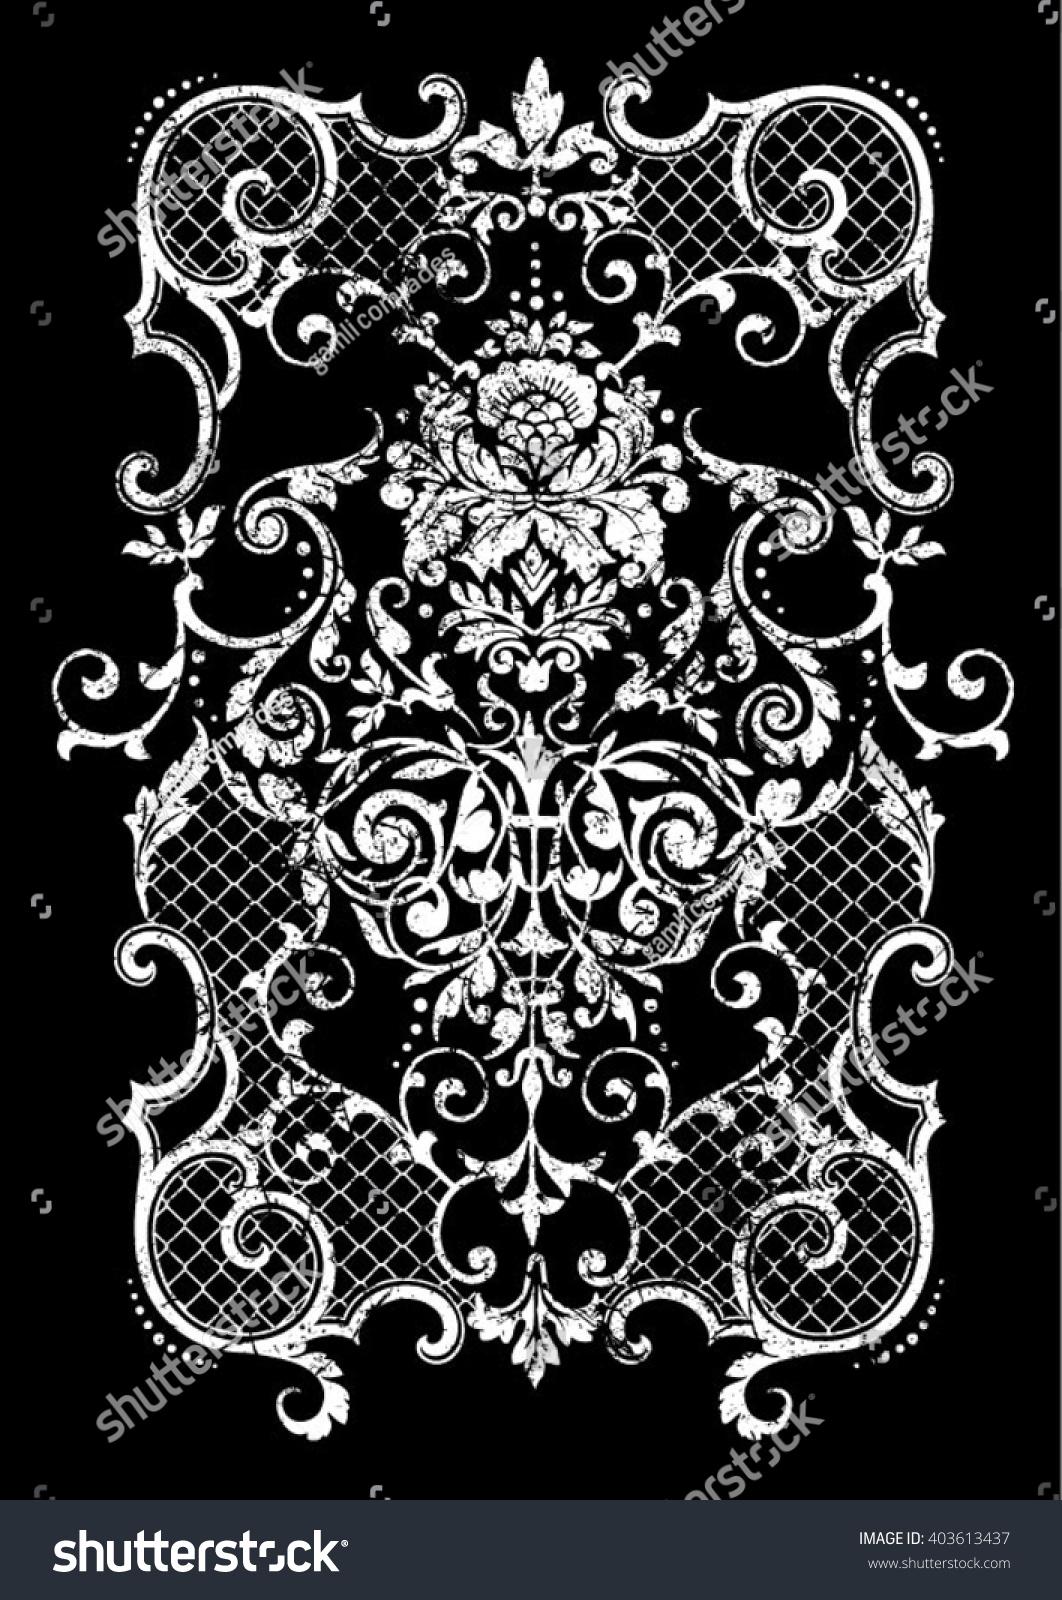 vintage baroque border flower motif retro stock vector. Black Bedroom Furniture Sets. Home Design Ideas